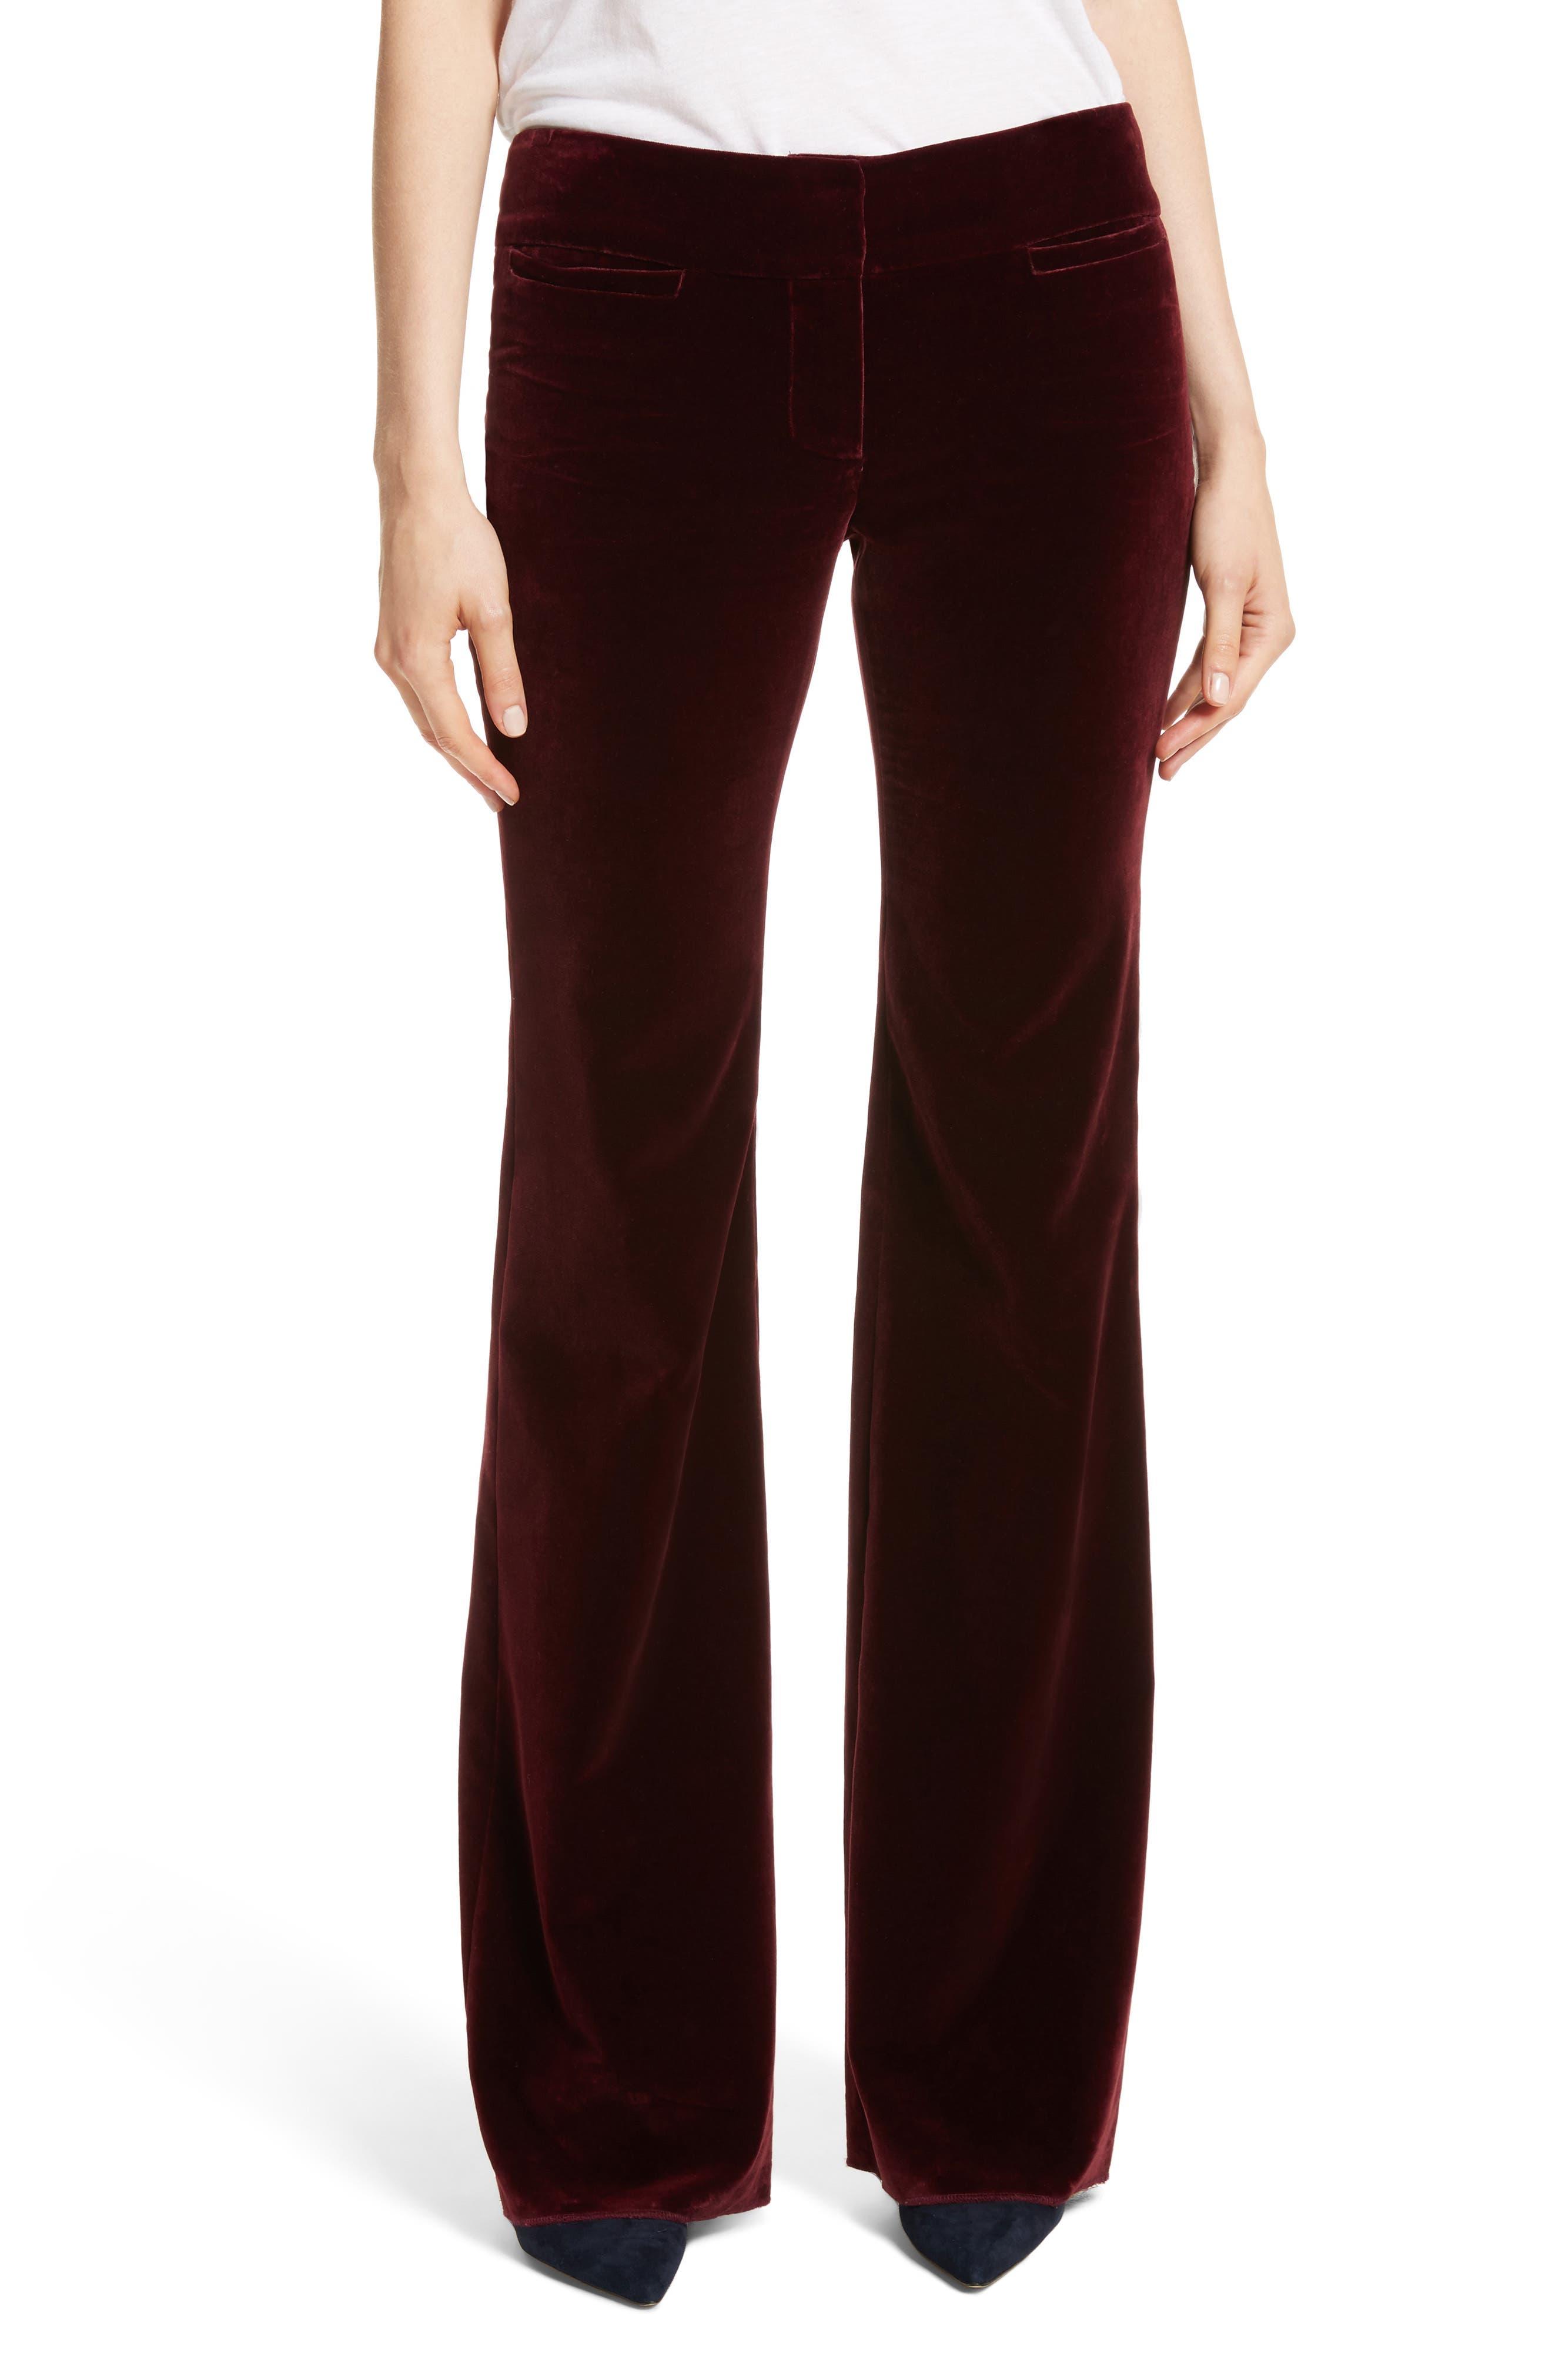 Amoire Velvet Flare Pants,                             Main thumbnail 1, color,                             603